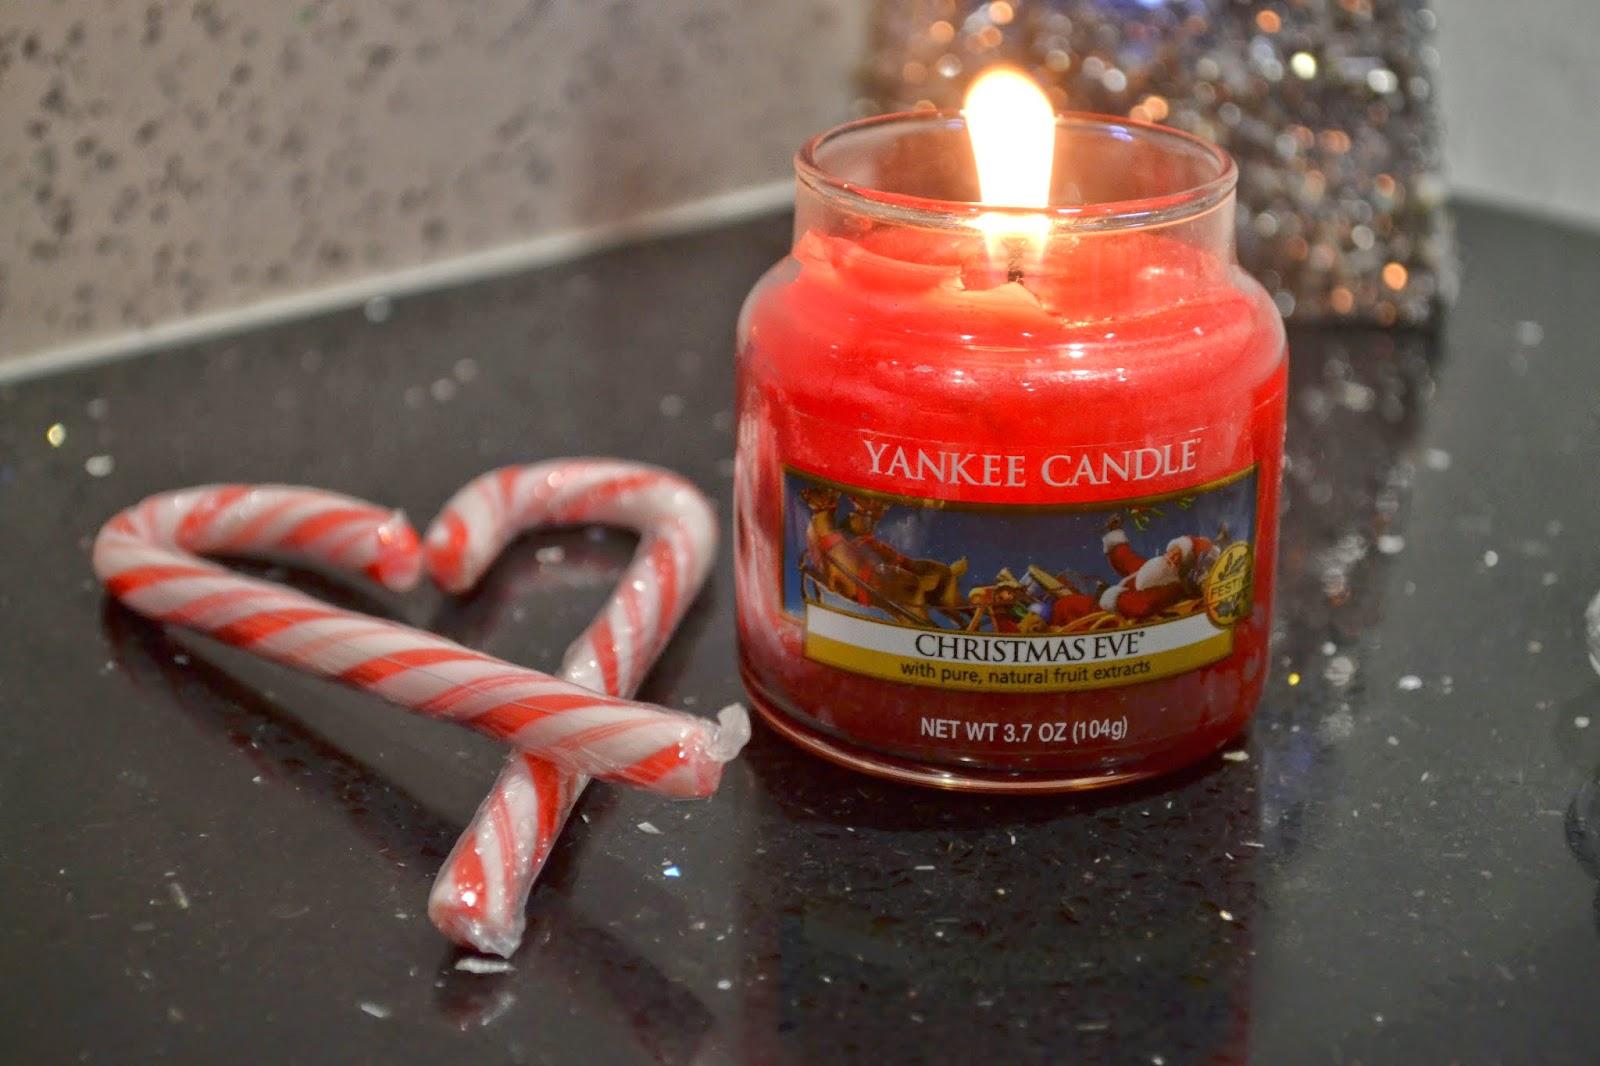 Christmas Eve Yankee Candle